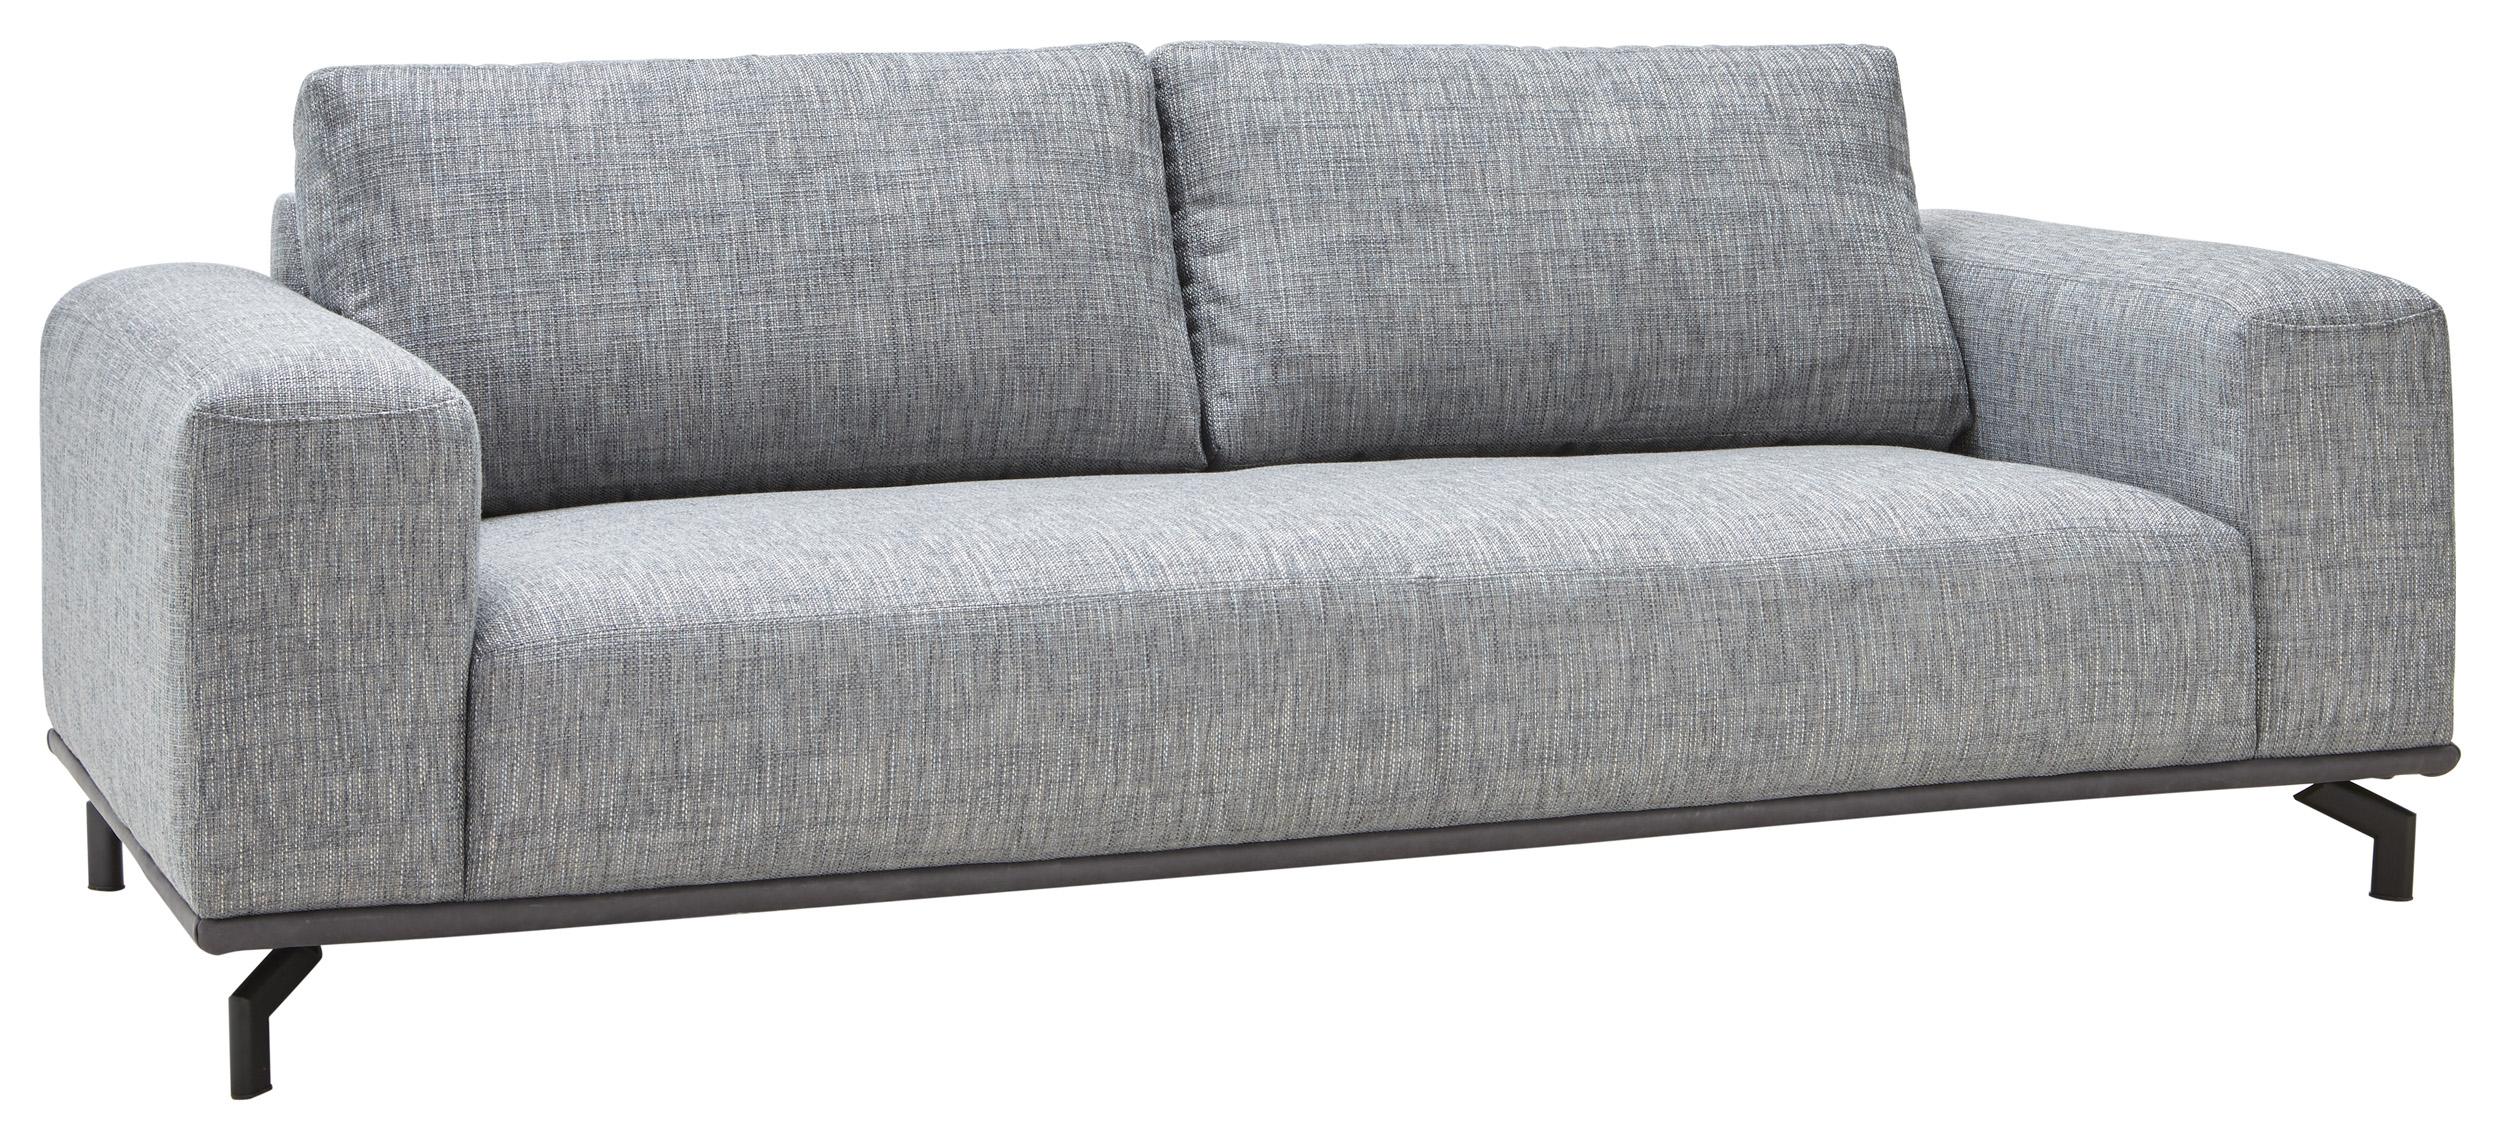 Full Size of Natura Sofa Newport Gebraucht Love Kaufen Couch Kansas Home Denver Livingston Brooklyn Pasadena 2 Büffelleder Mit Bettkasten Chippendale Ohne Lehne Verkaufen Sofa Natura Sofa